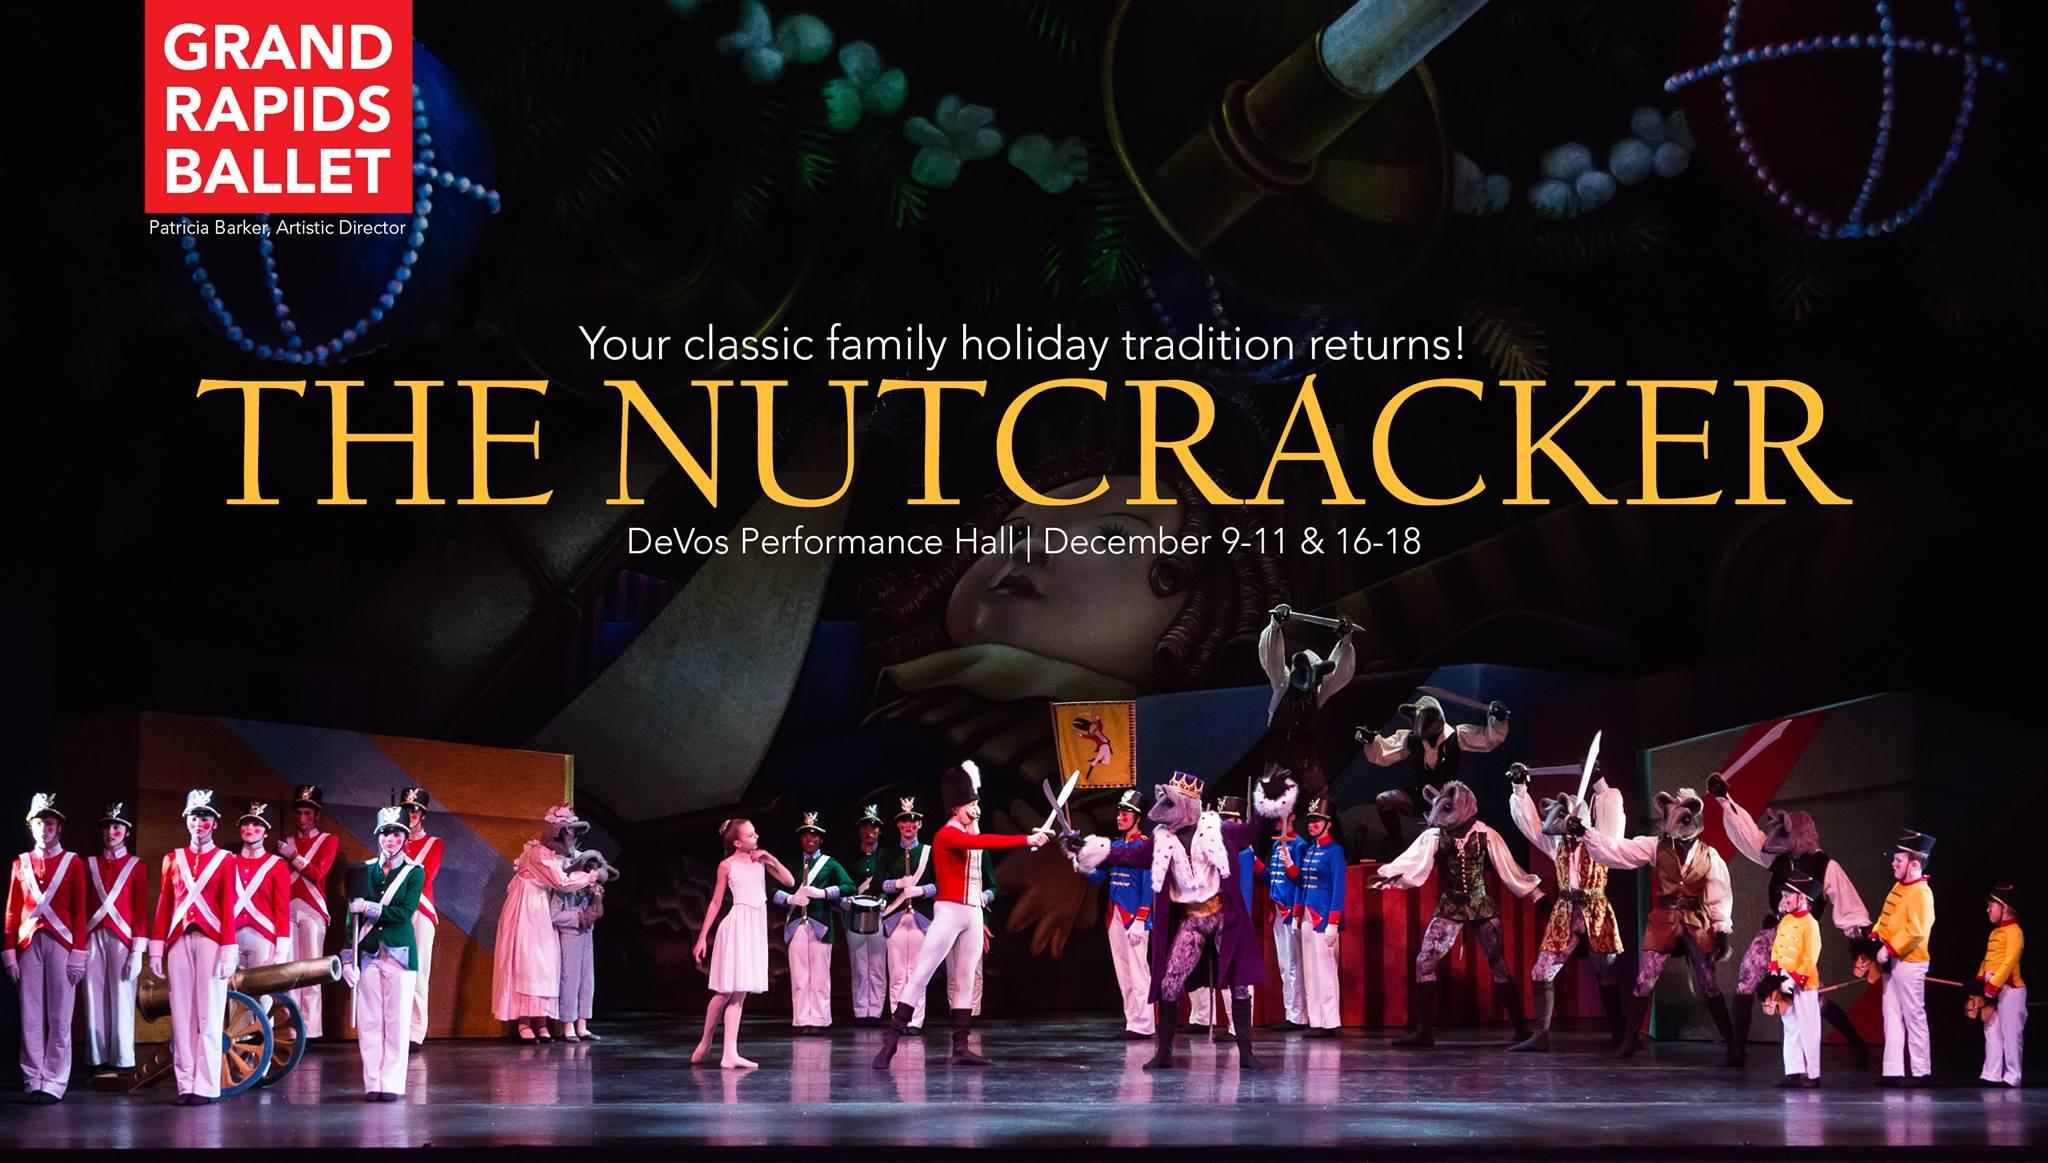 Grand Rapids Ballet Presents The Nutcracker West